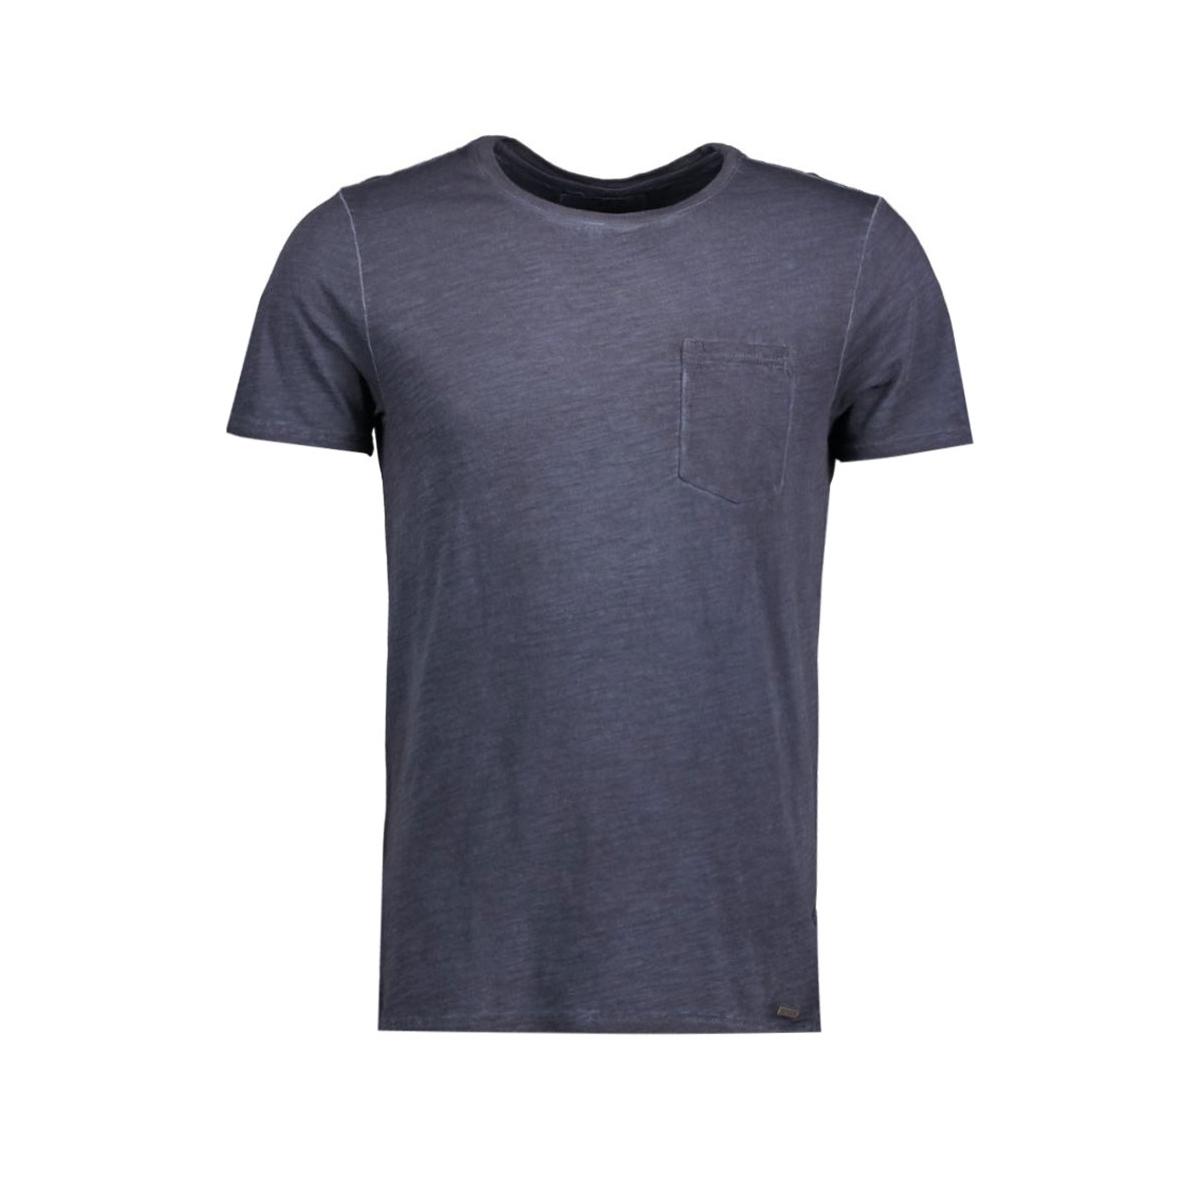 z1063 garcia t-shirt 292 dark moon